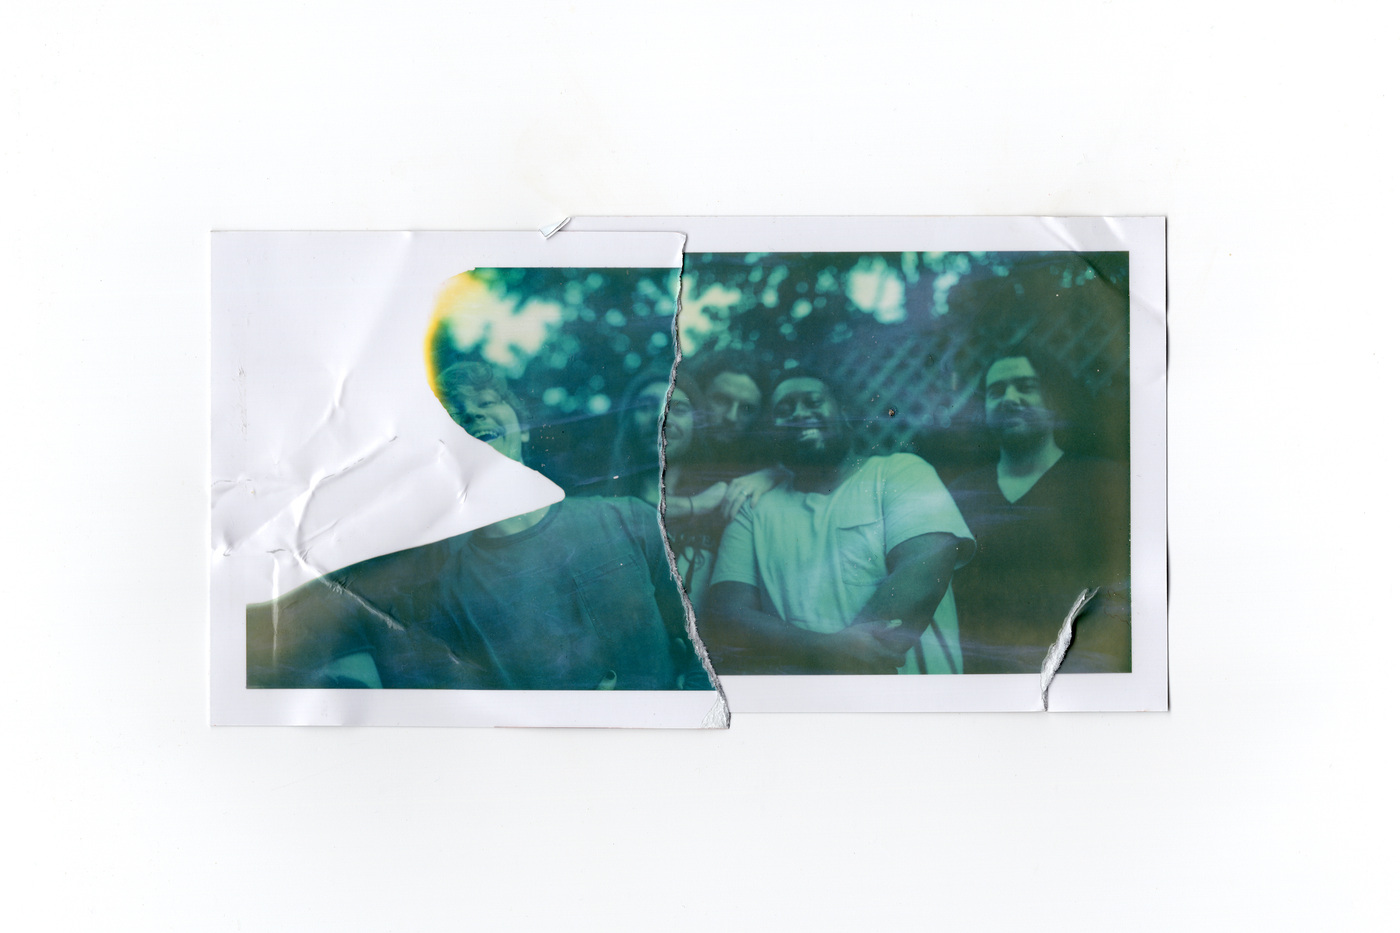 Brian Garbrecht - Wilmette. Elgin, IL. 2020. Expired Polaroid Collage.